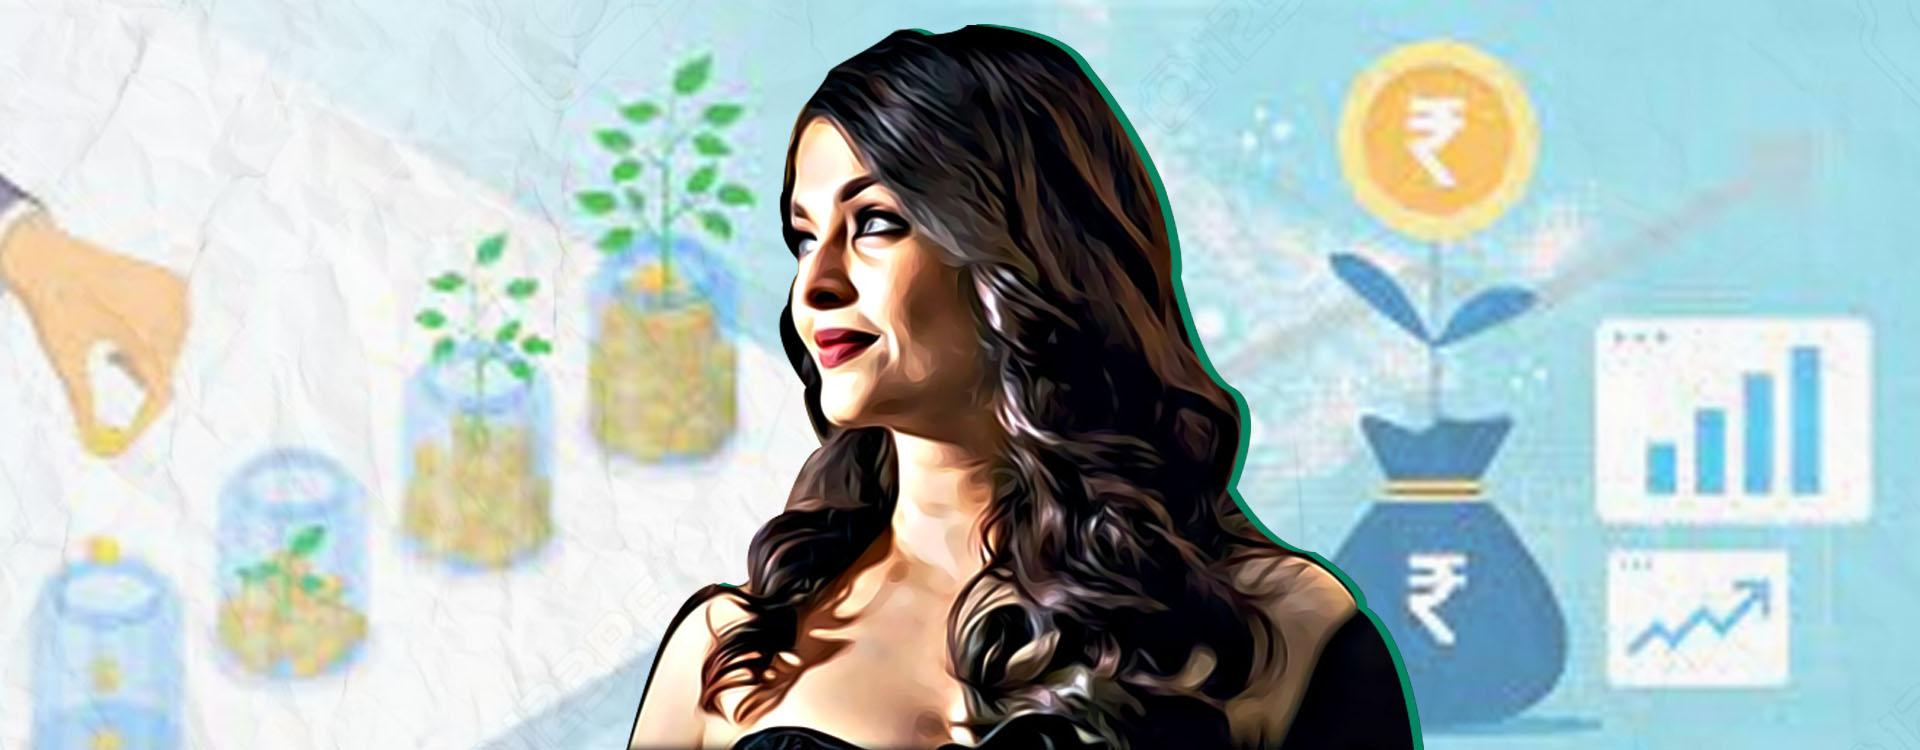 Celebrities like Aishwarya Rai invest in startups: Why the sudden interest?